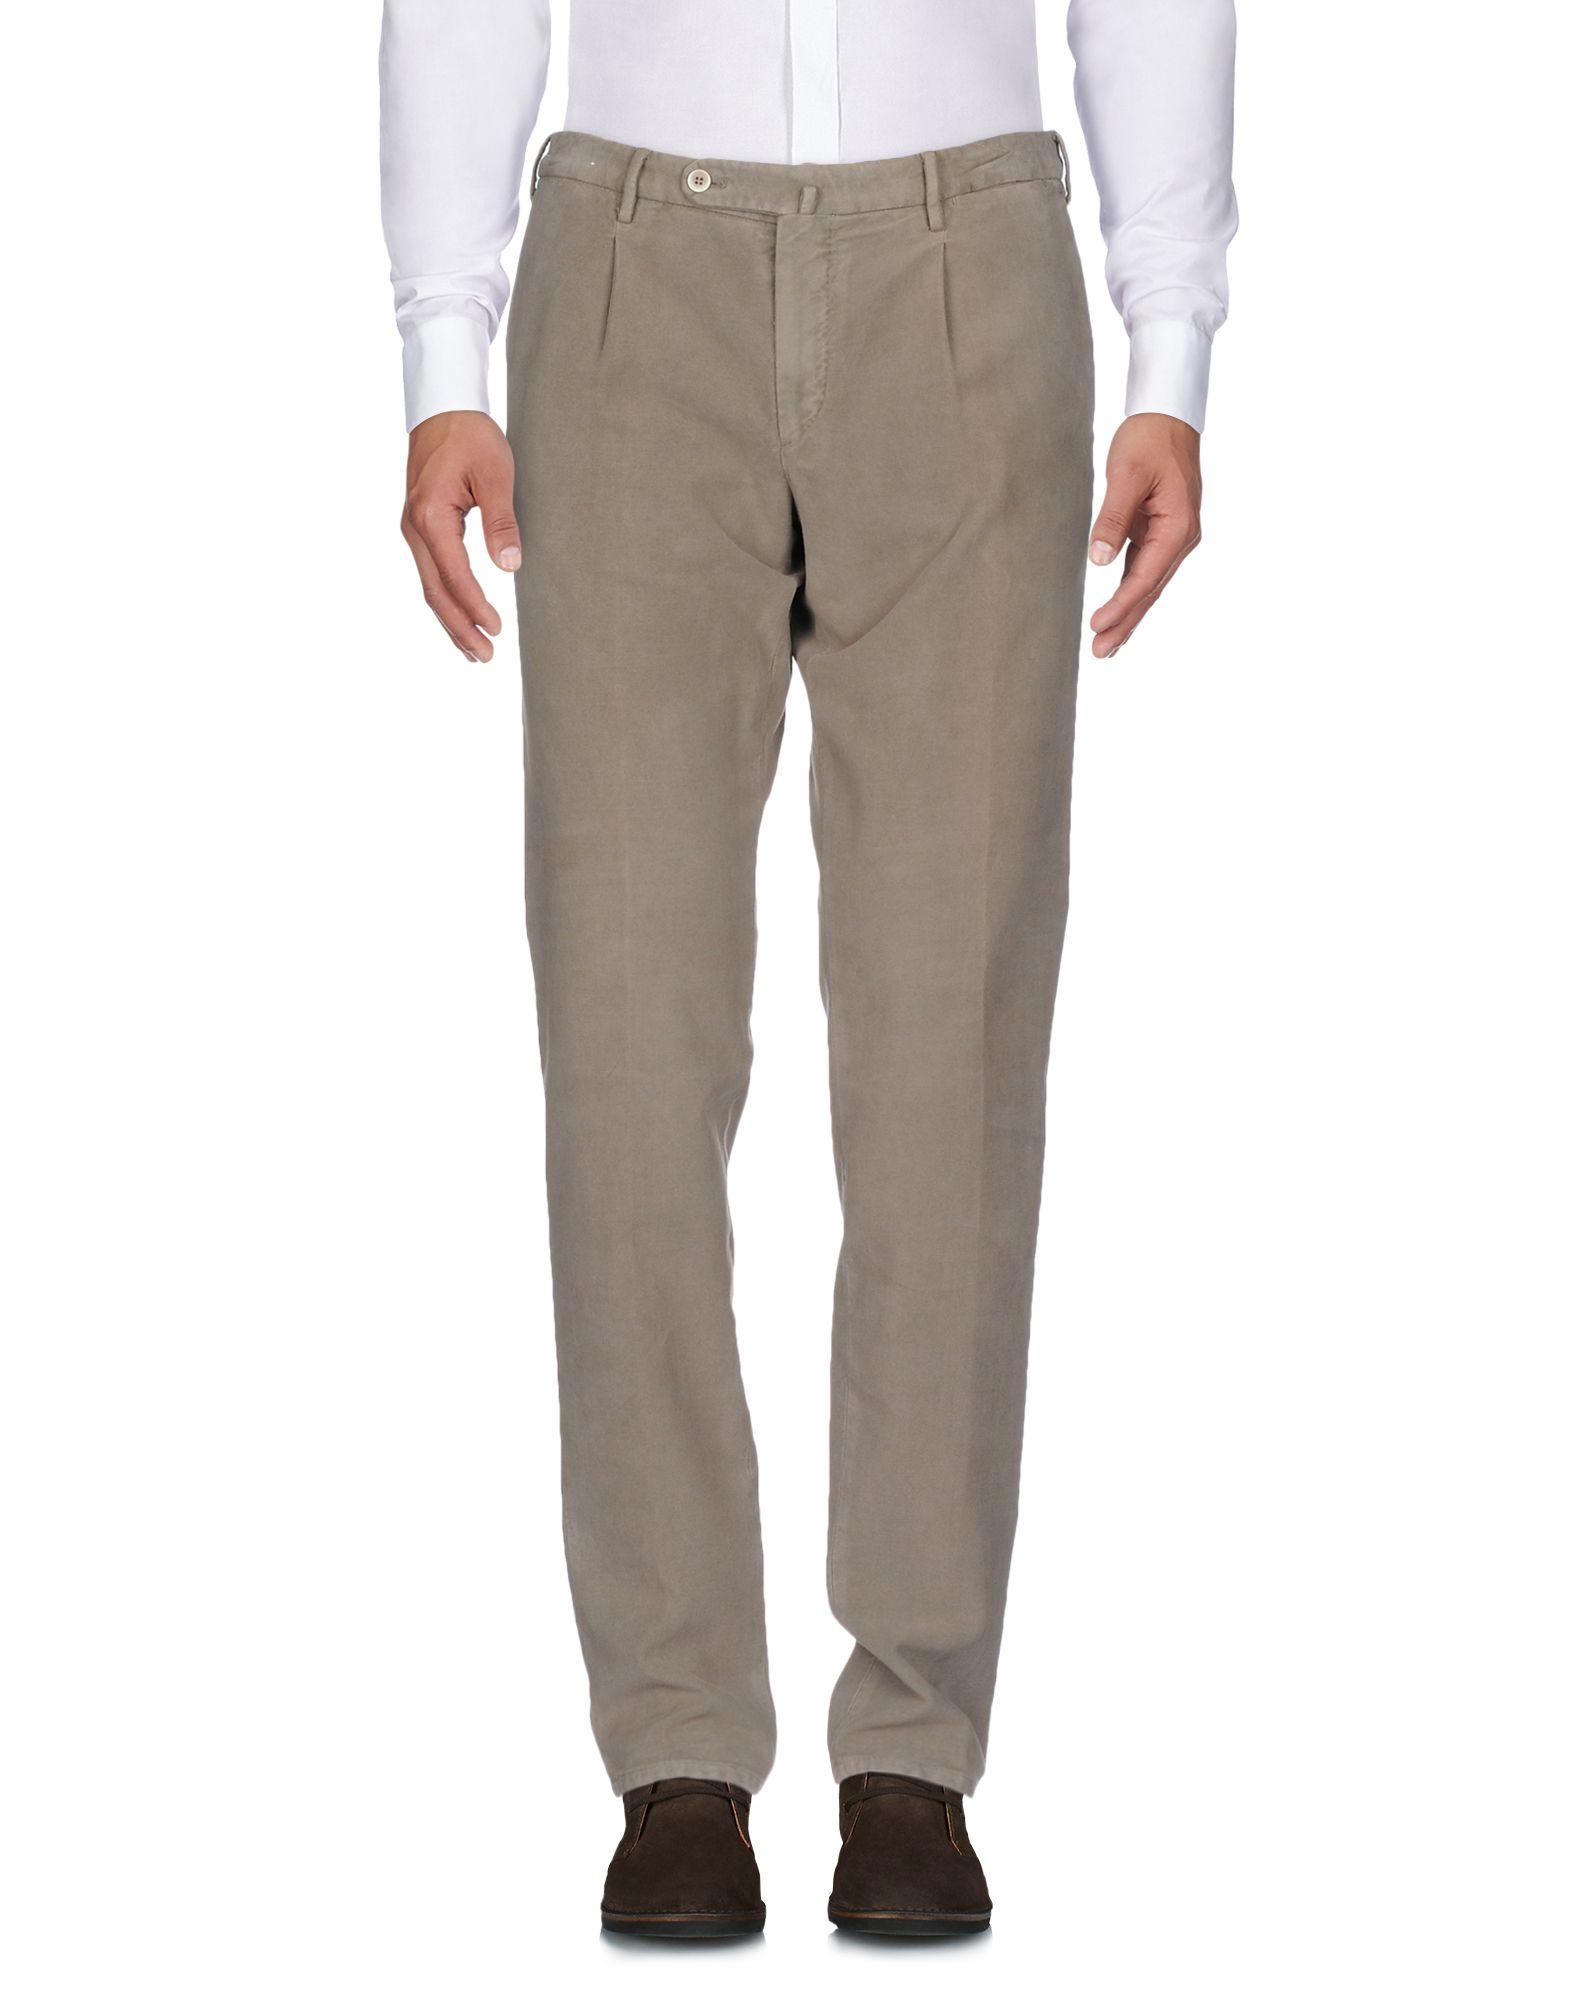 G.T.A. MANIFATTURA PANTALONI Повседневные брюки брюки pantaloni torino синий